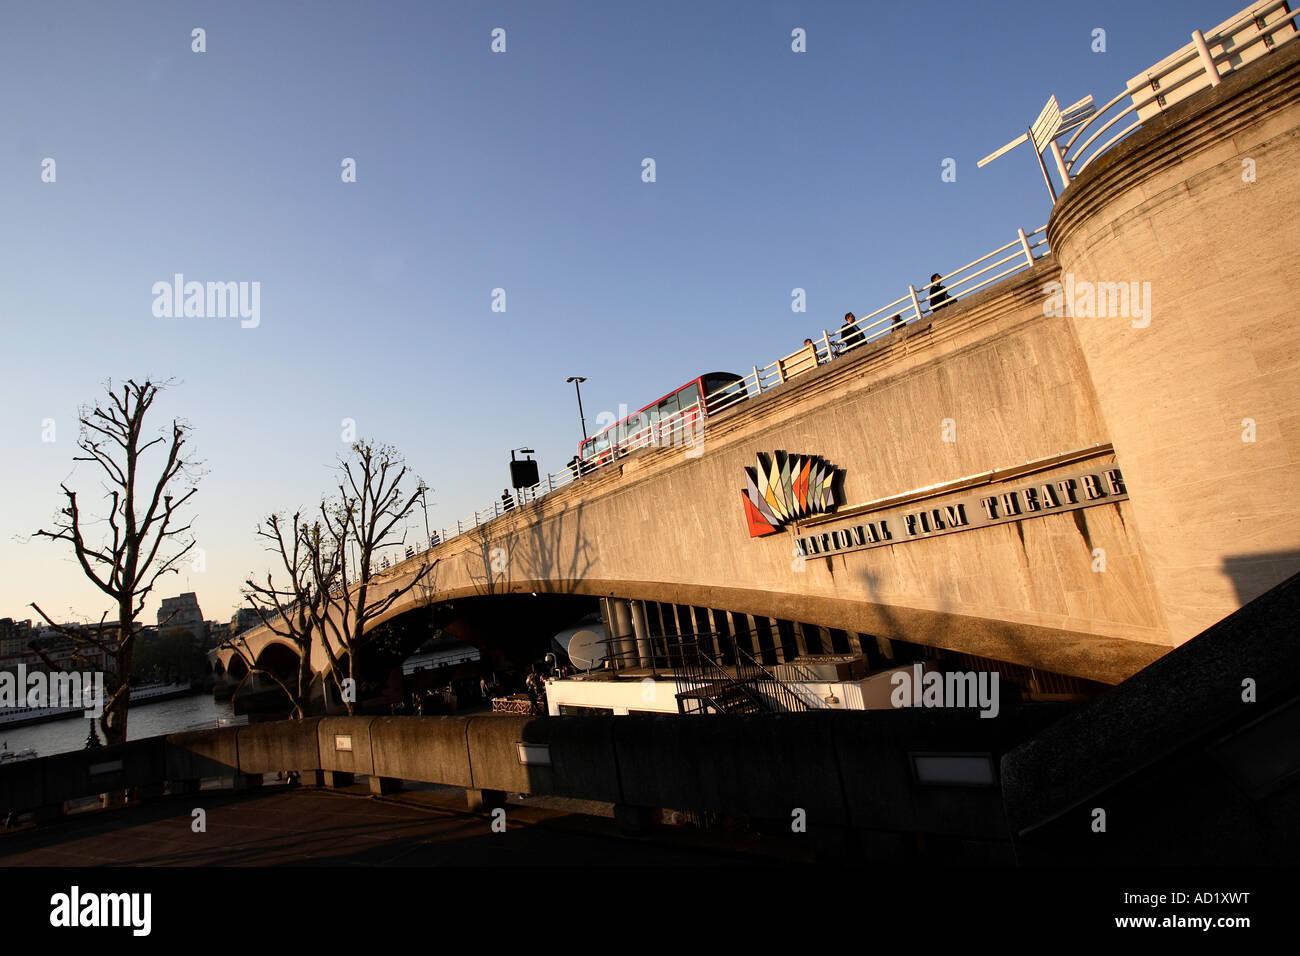 National Film Theatre Zeichen auf Waterloo Bridge. South Bank, London, England, UK Stockbild